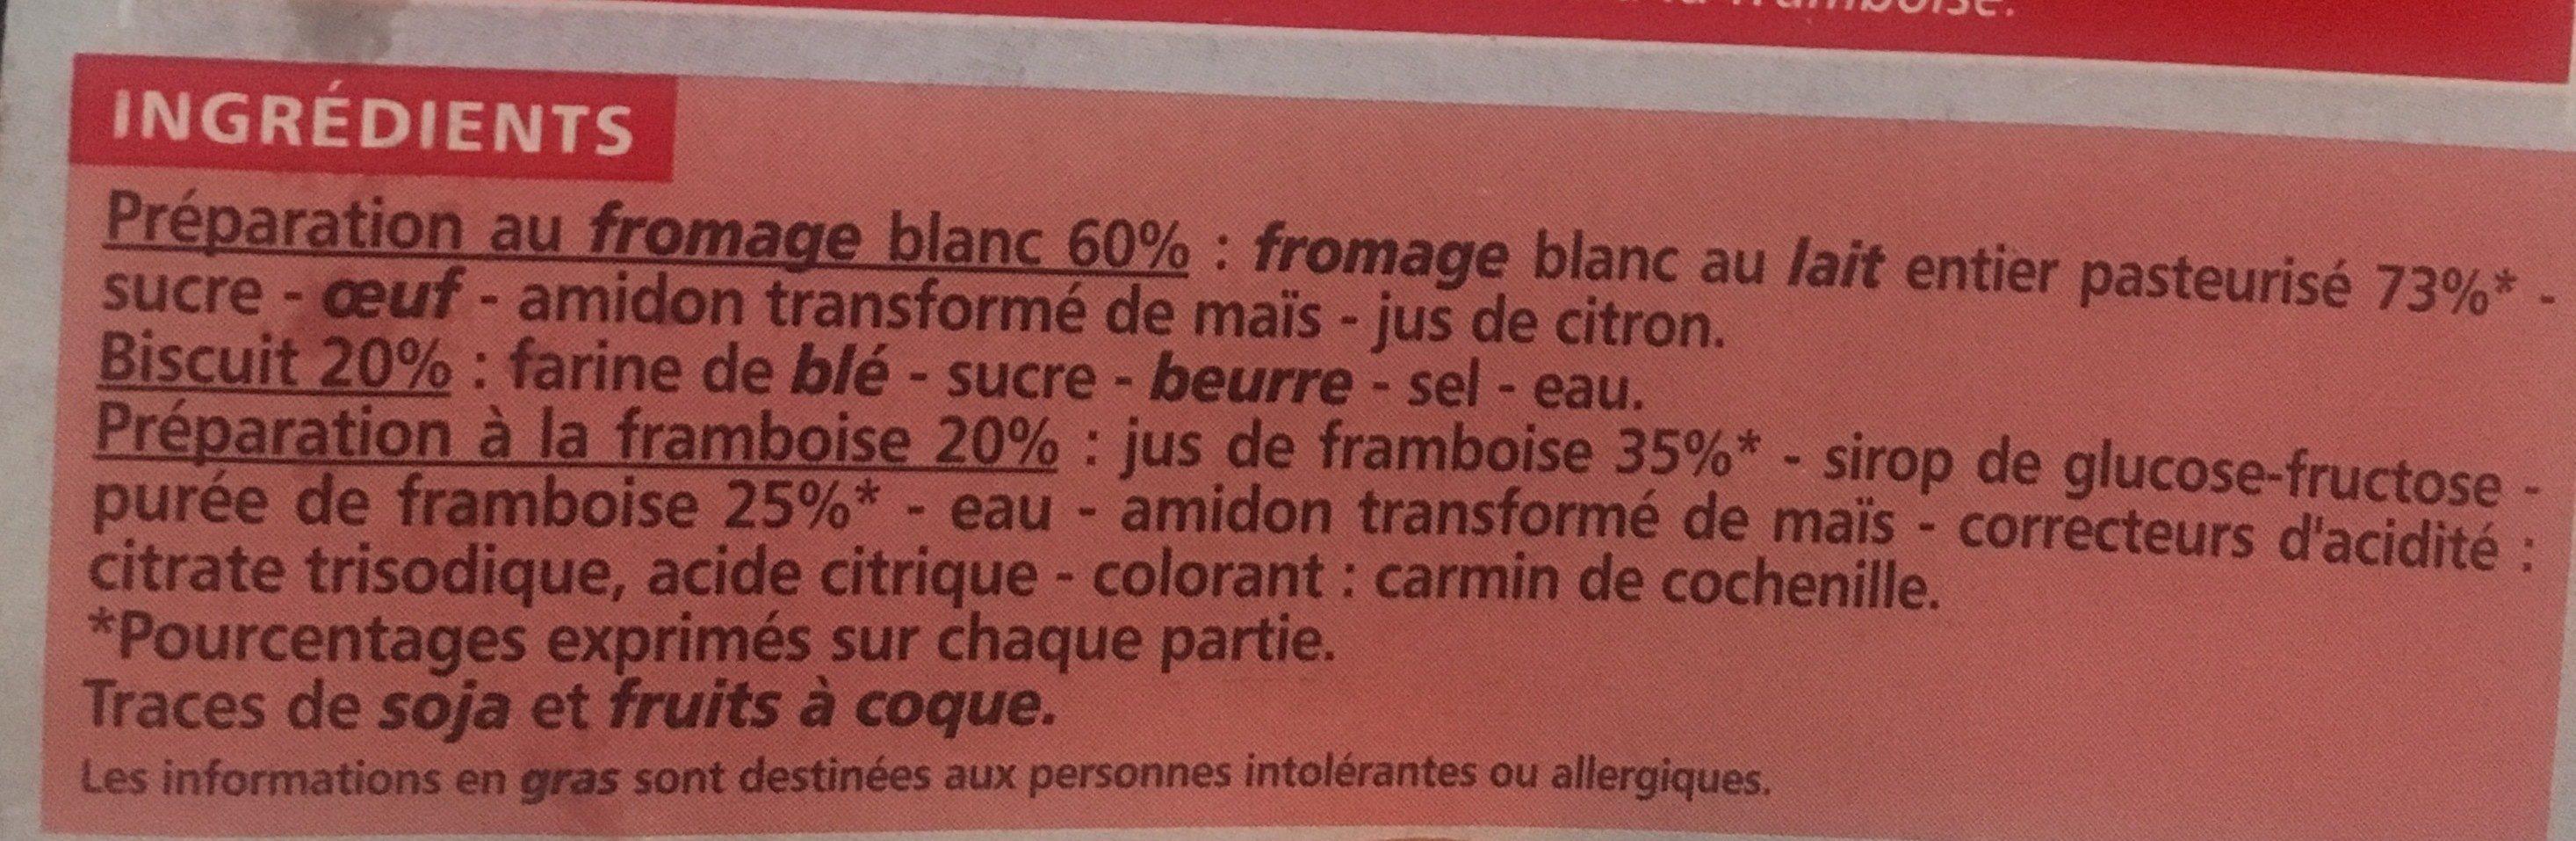 Cheesecake Framboise - Ingrédients - fr